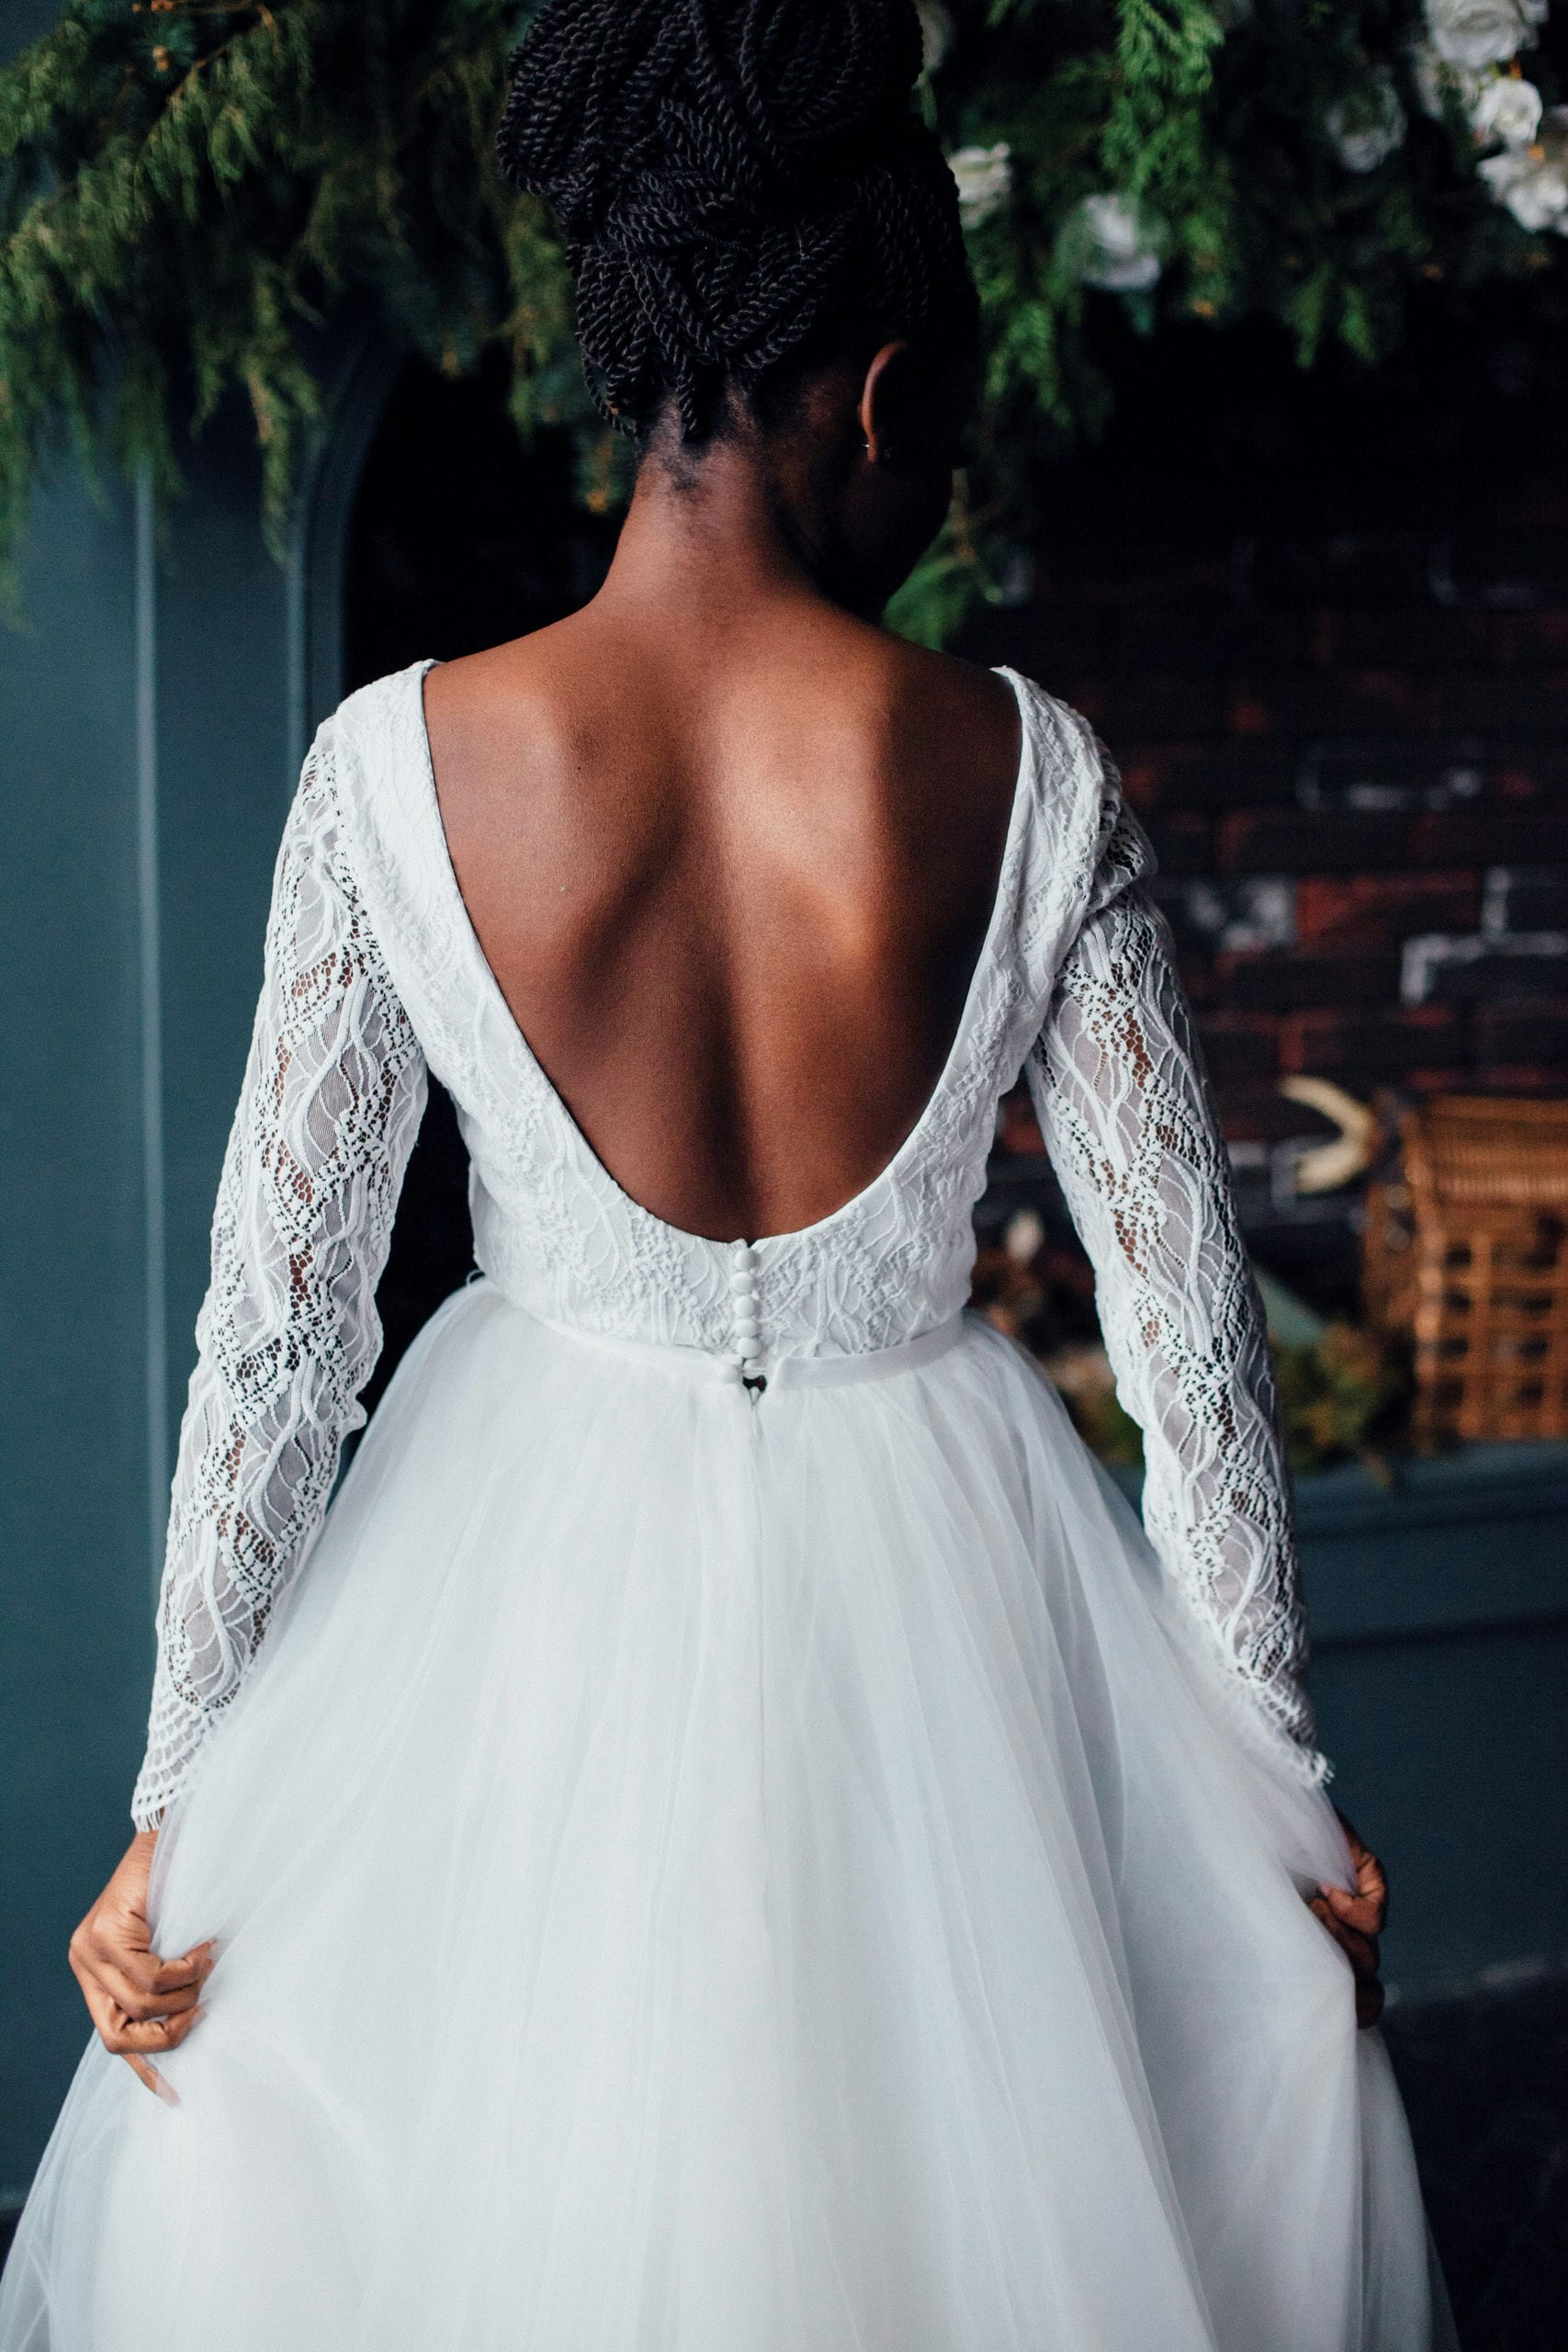 Свадебное платье JESSICA, коллекция THE ABSOLUTE LOVE, бренд RARE BRIDAL, фото 2